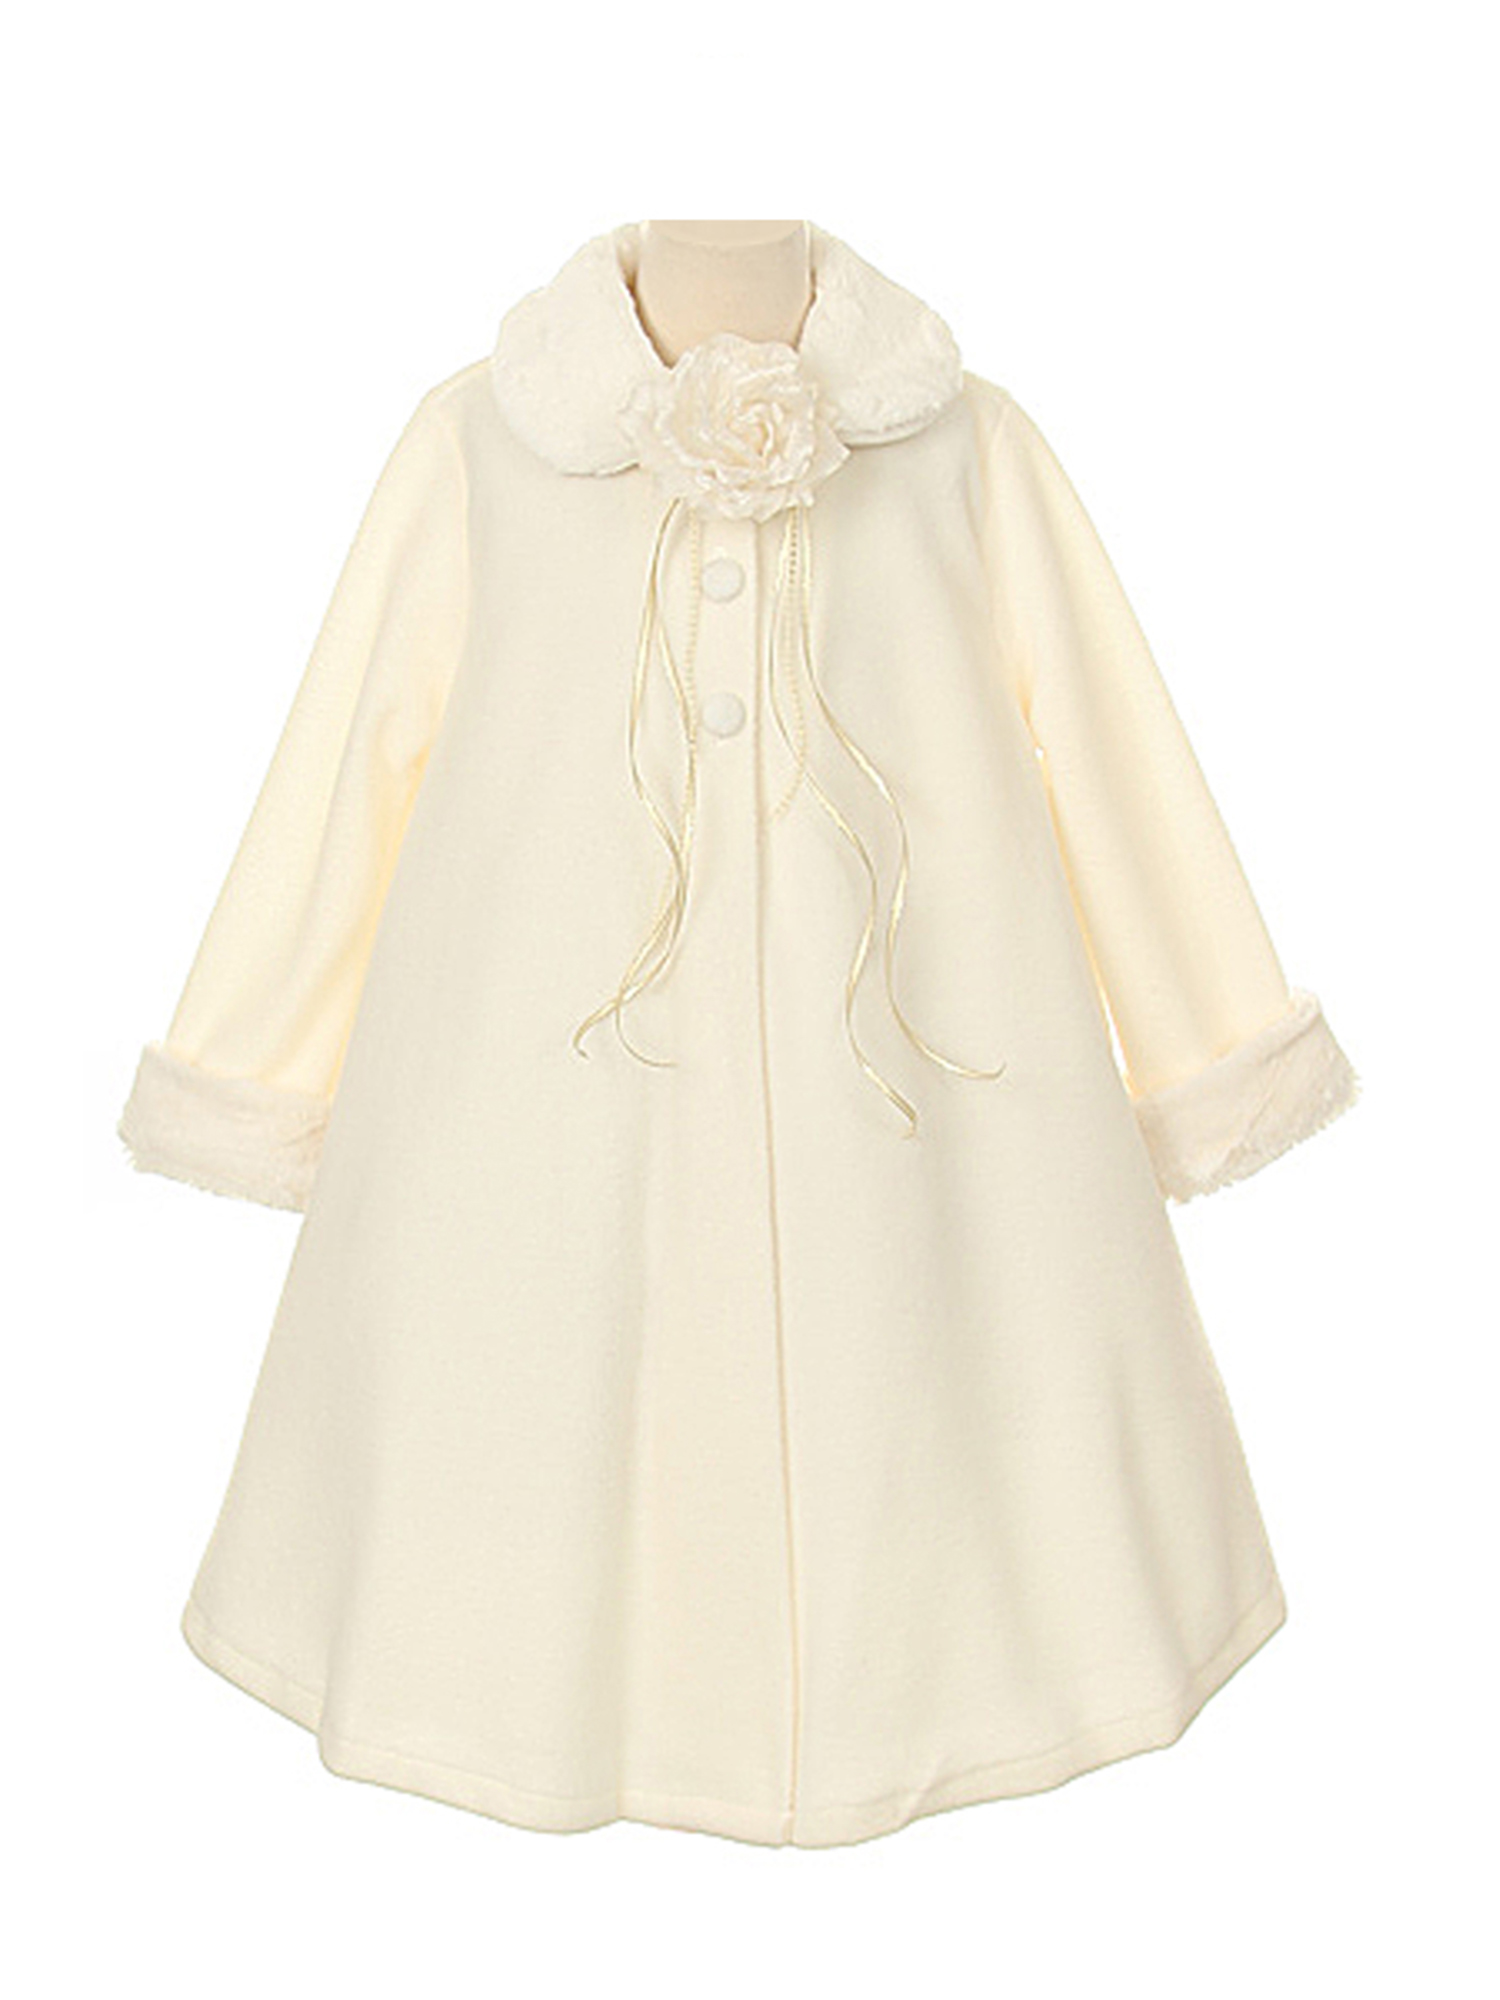 Dempsey Marie Cozy Fleece Long Sleeve Cape Jacket Coat